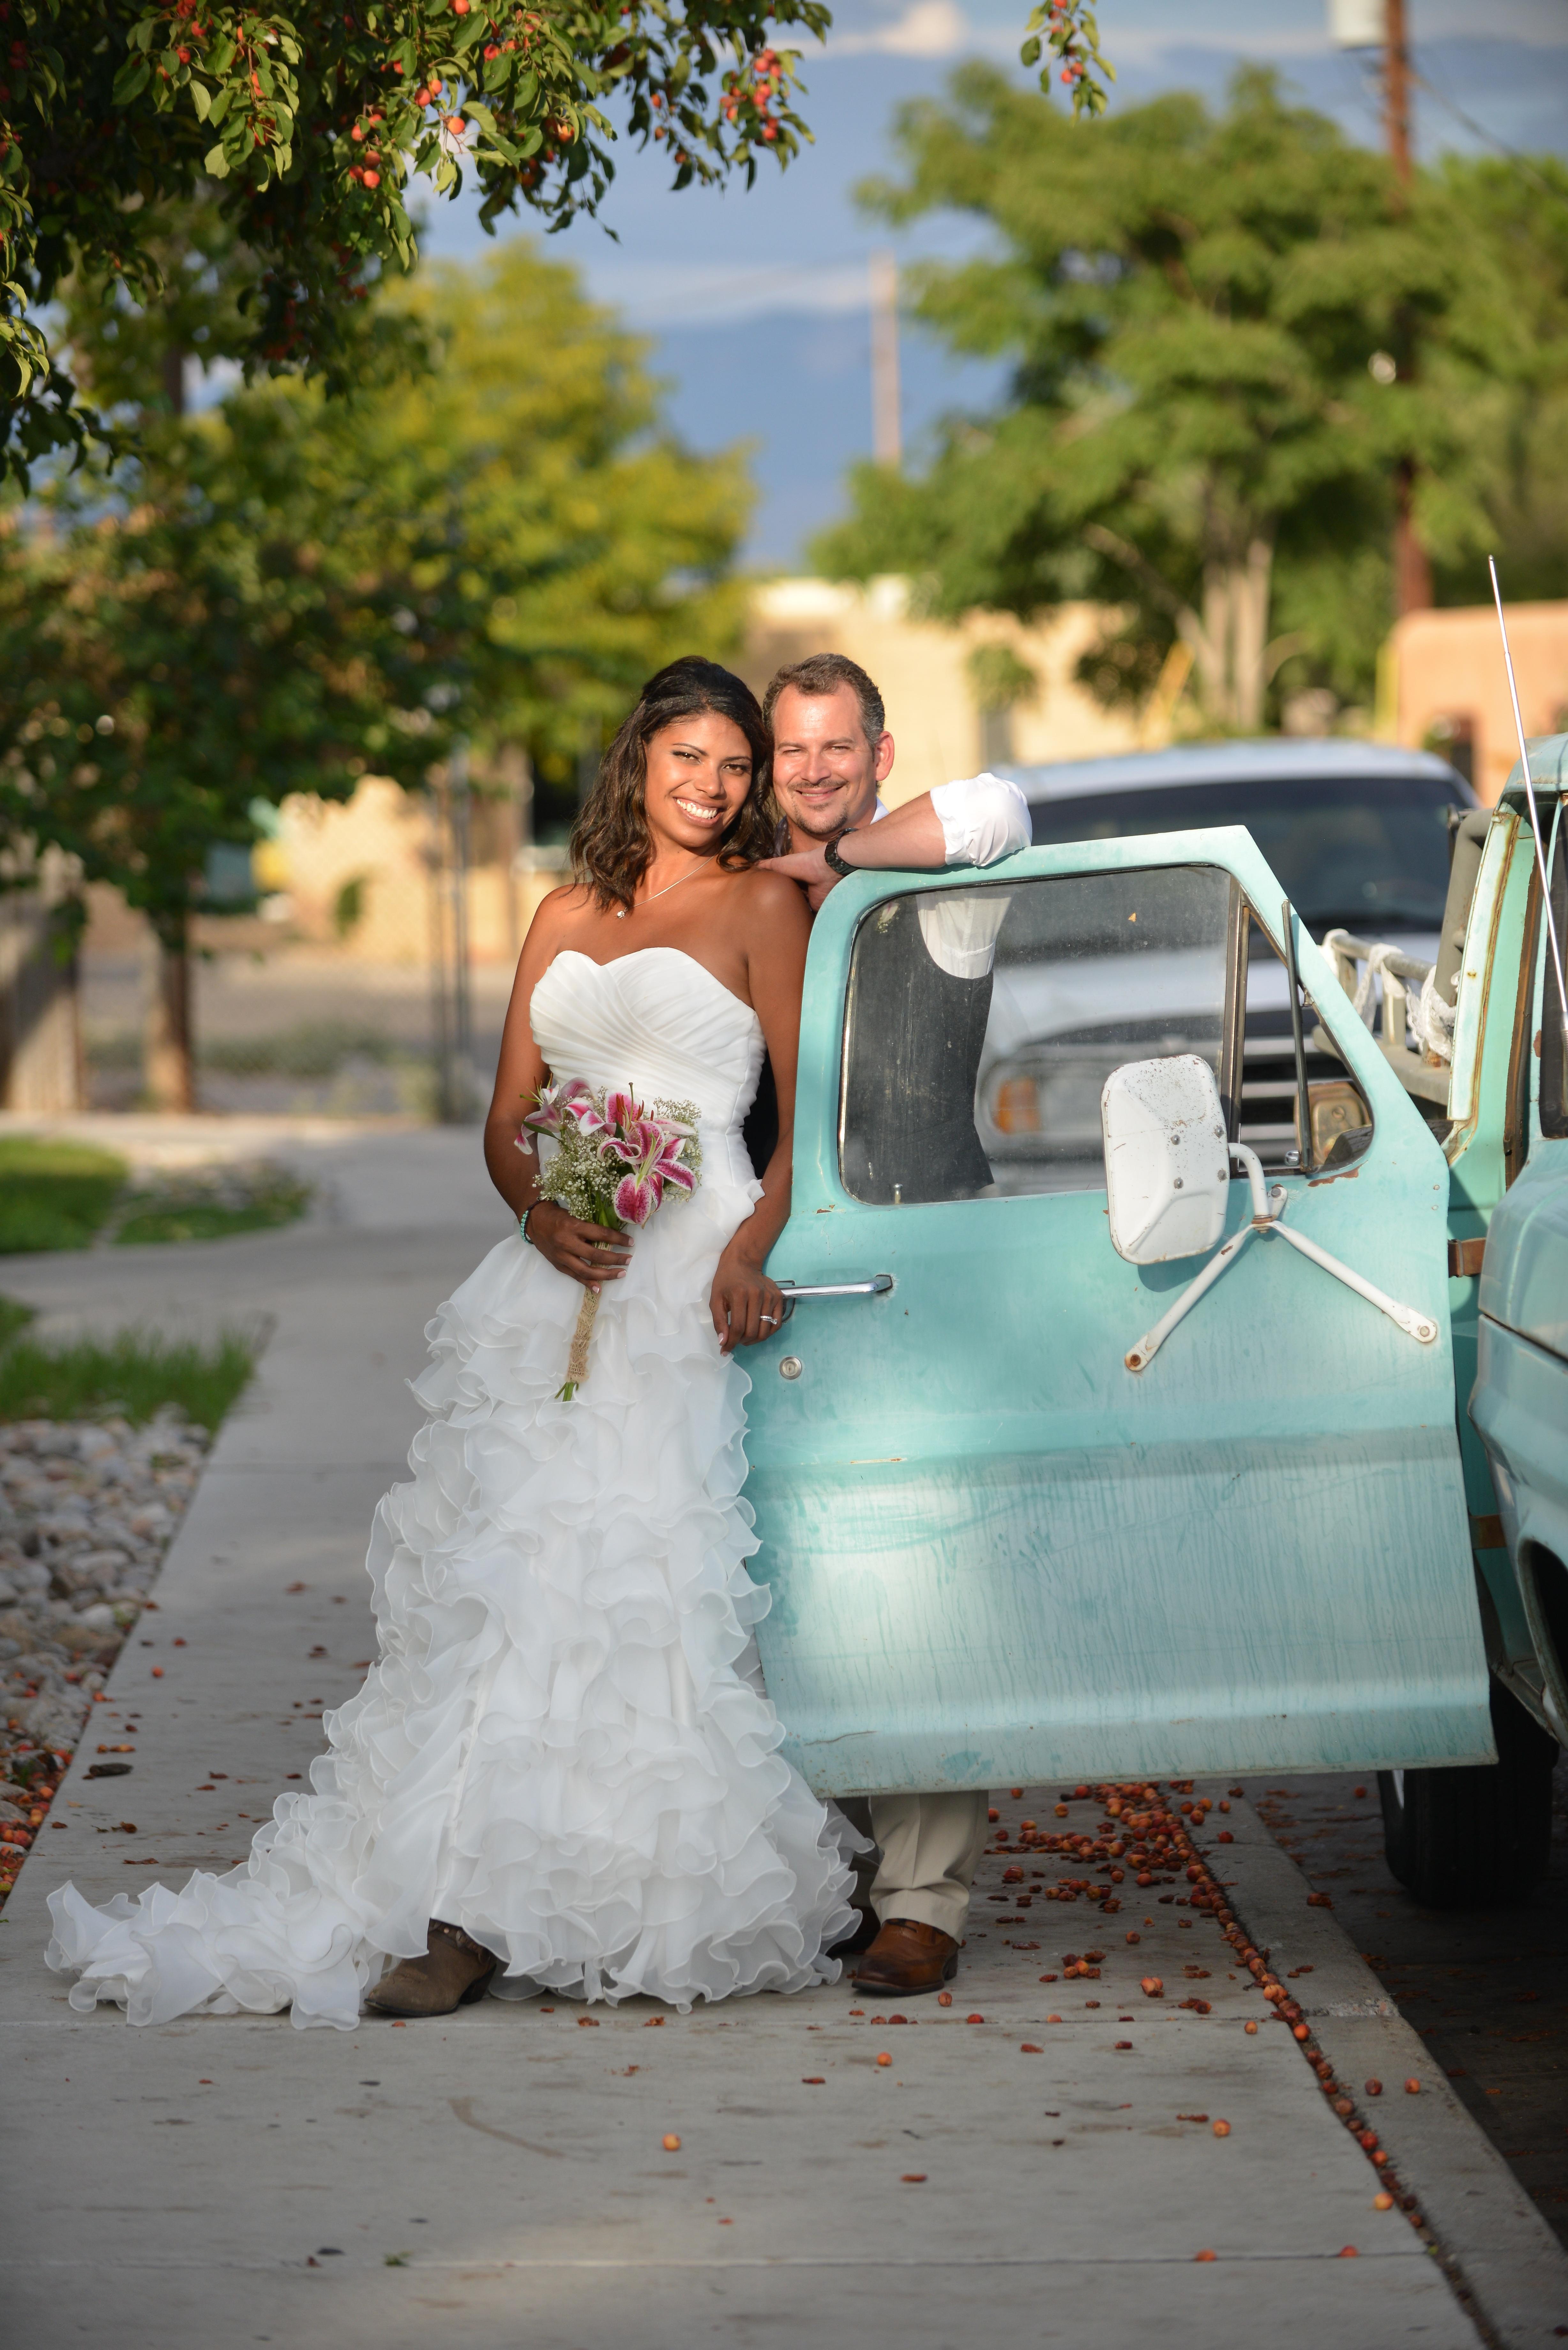 Fotos gratis : mujer, vendimia, celebracion, camión, romance, Boda ...